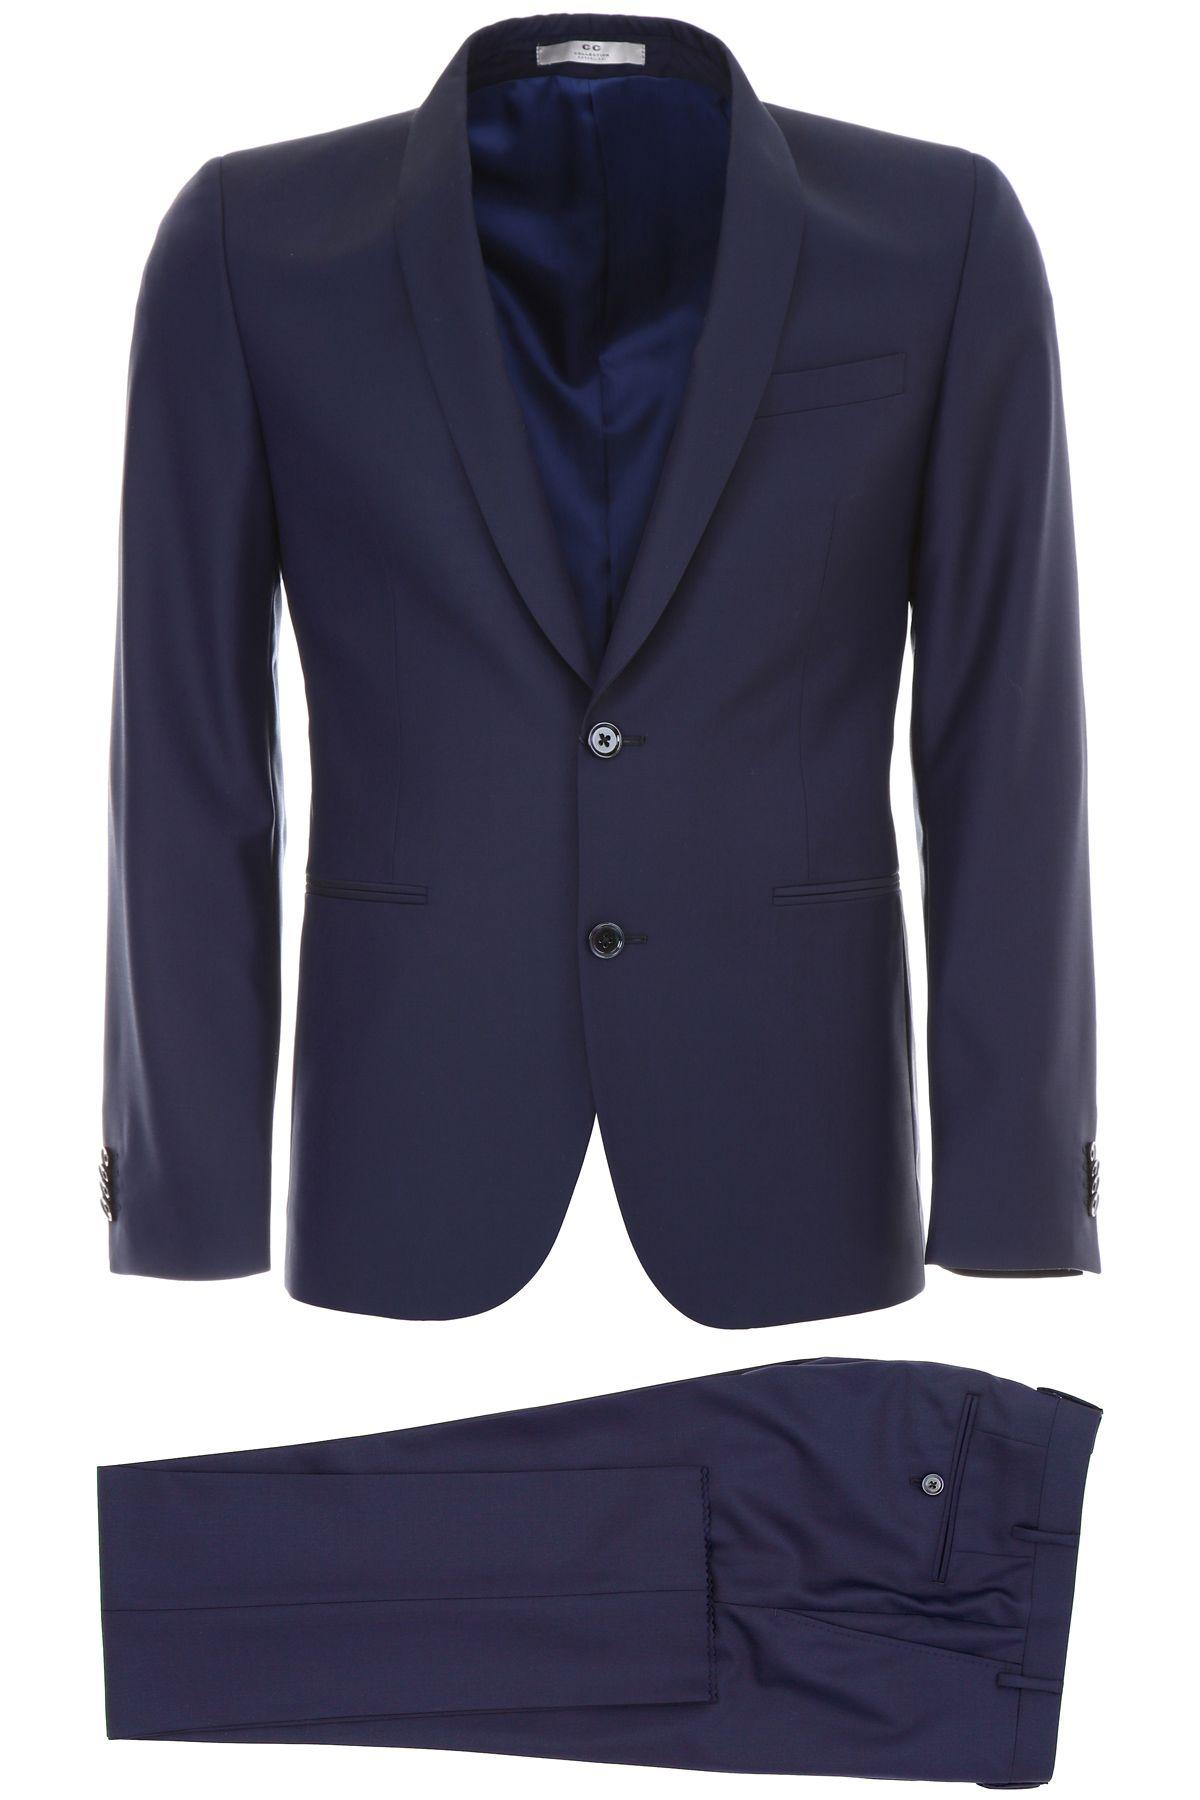 CC COLLECTION CORNELIANI Virgin Wool Suit in Blu Navy